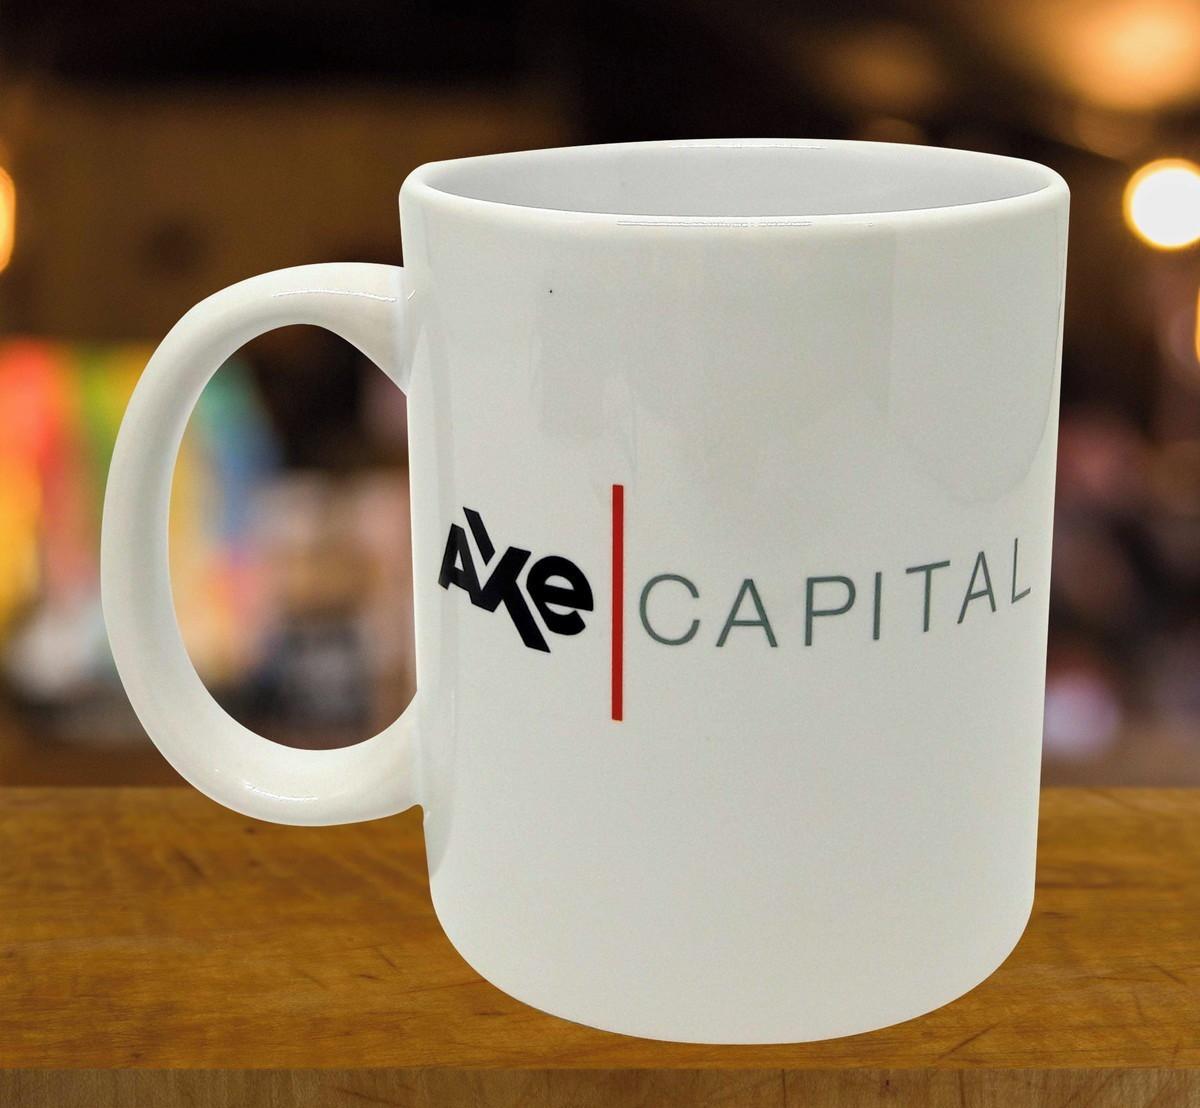 Caneca: Axe Capital Bob - Billions - EV